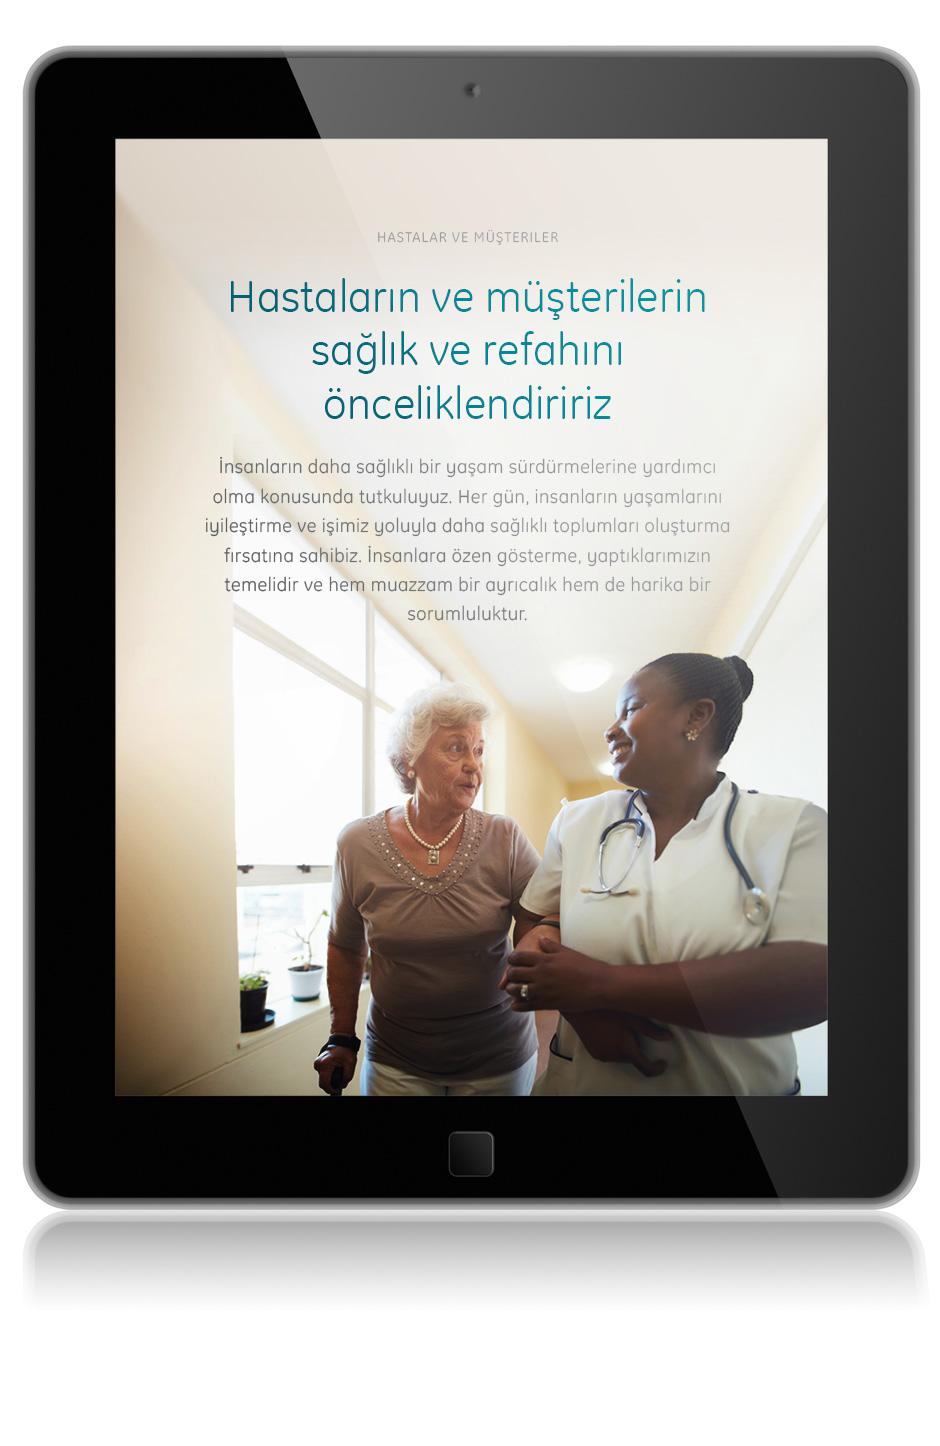 OurWork_Train75k_iPad_Turkish.jpg